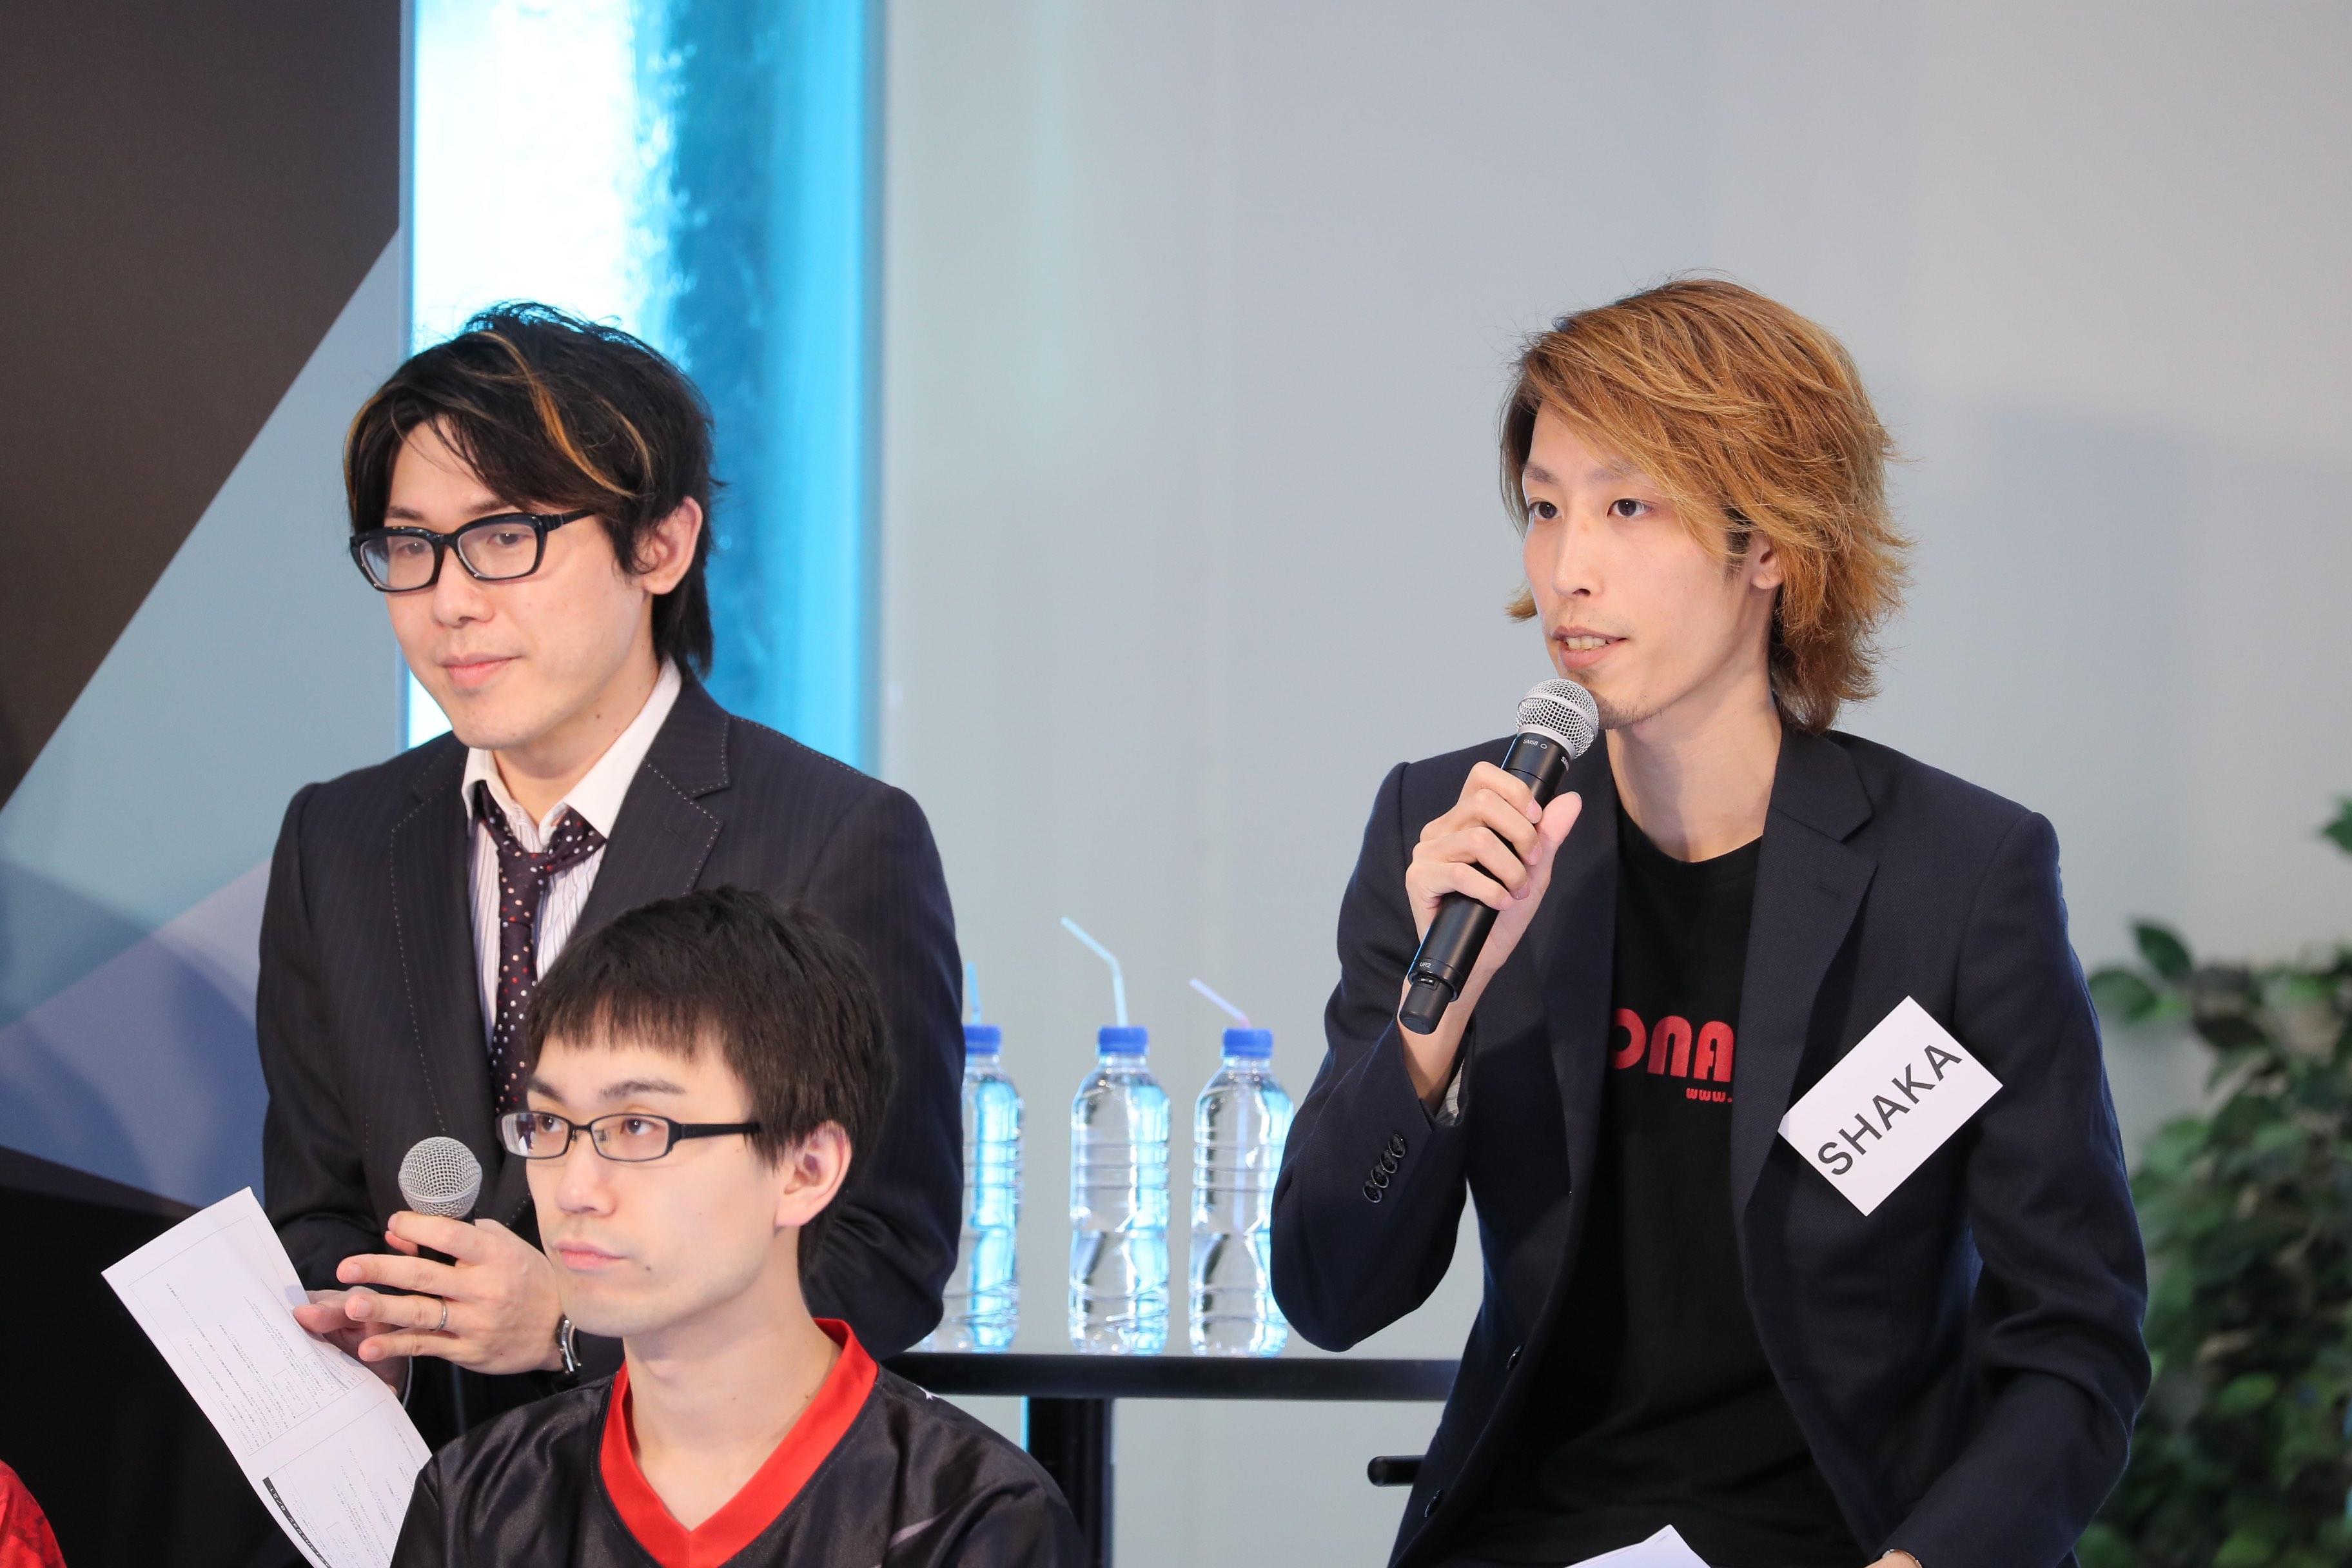 http://news.yoshimoto.co.jp/20180925045700-aab13f361d8937bfc6d33b2ae6327b5e8b6ef5cb.jpg